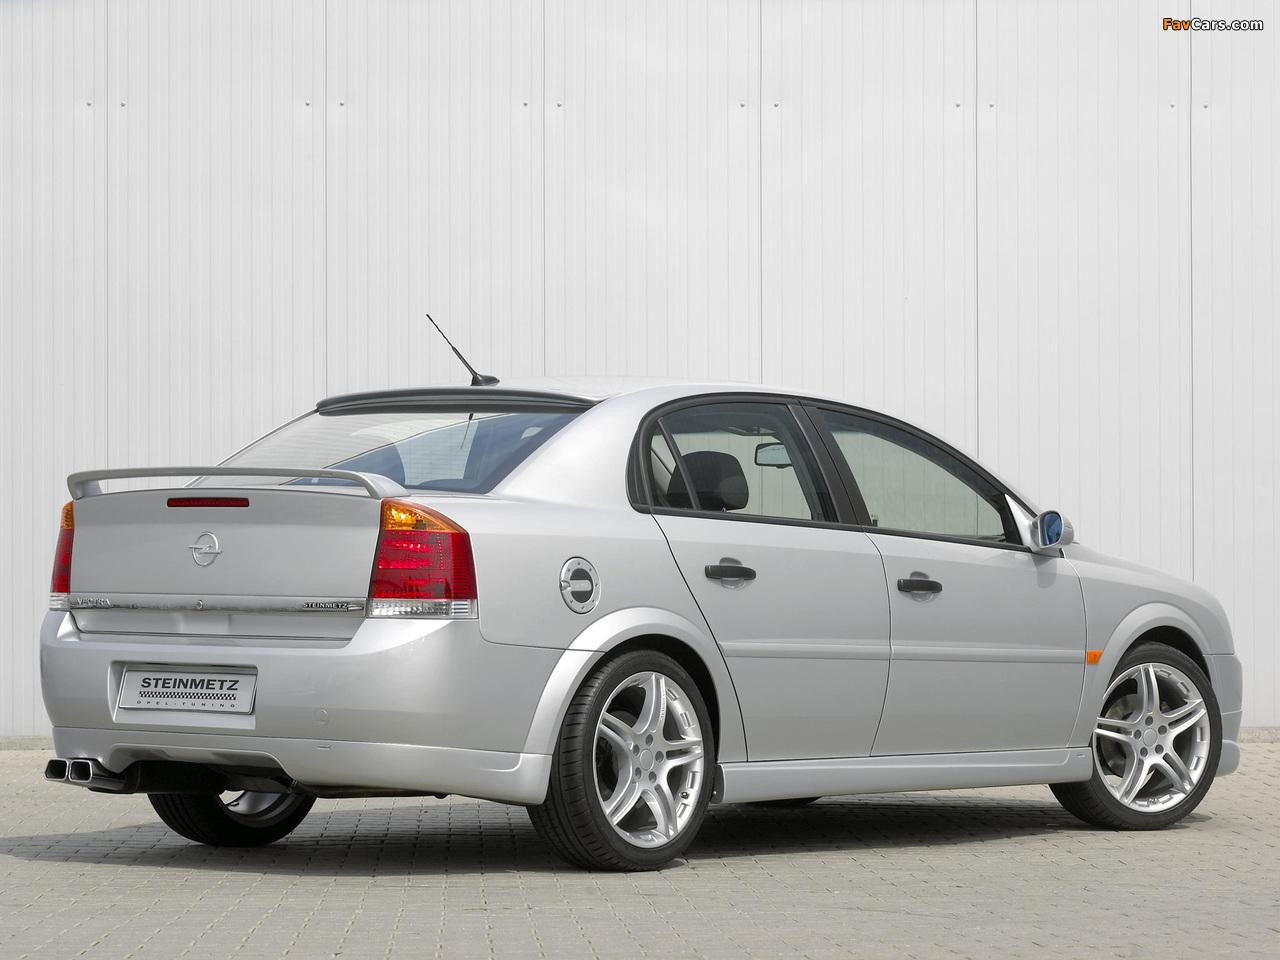 Steinmetz Opel Vectra Sedan (S) 2002–05 photos (1280 x 960)